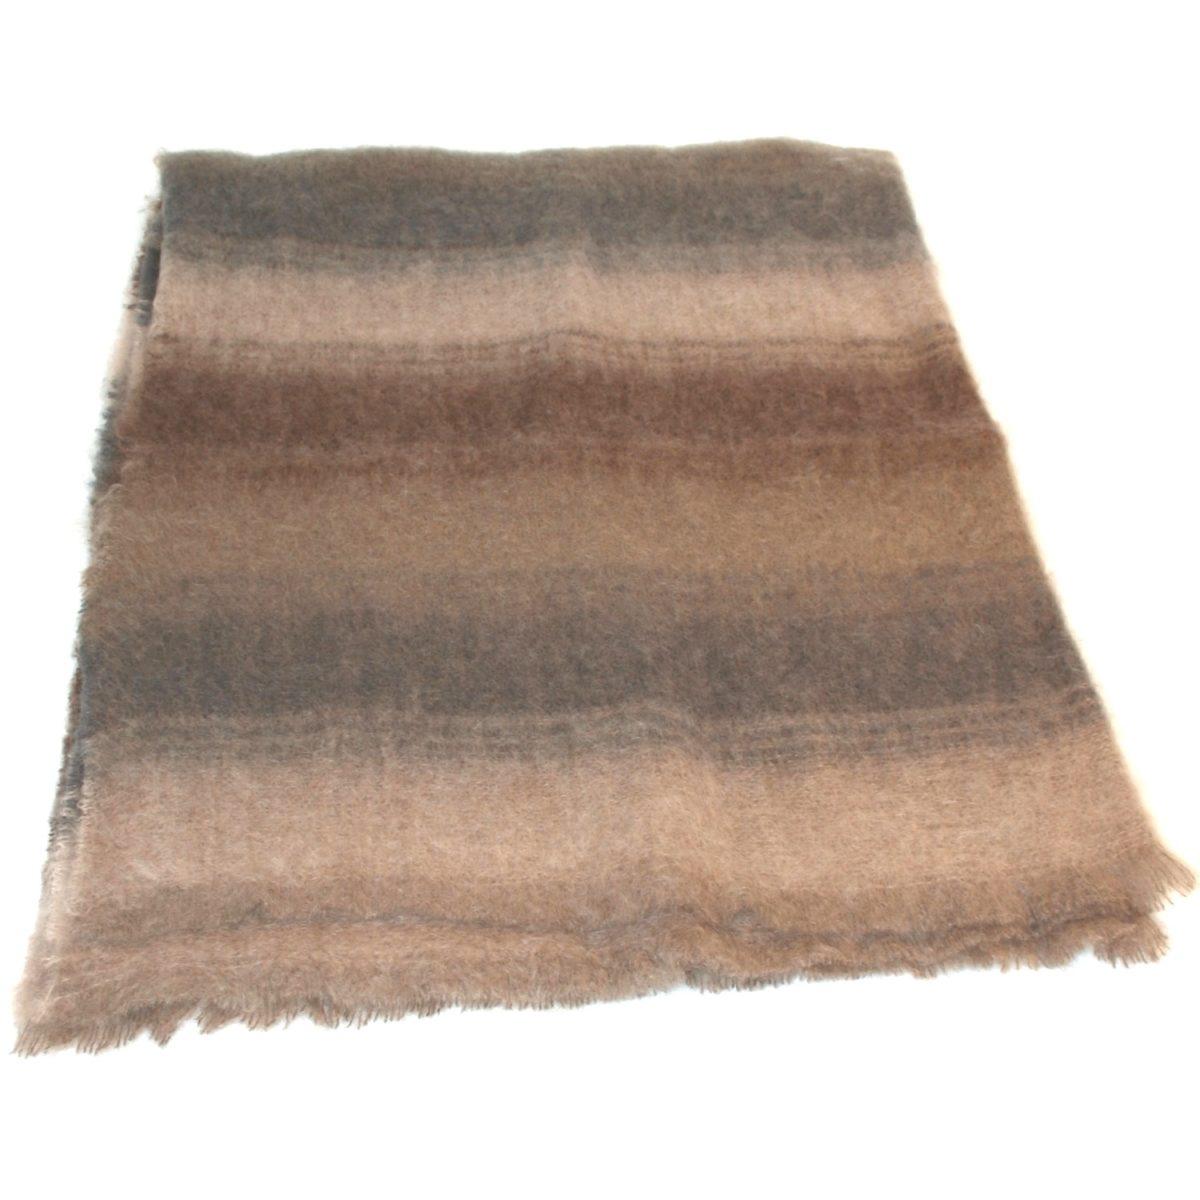 Mohair Blanket - Tan Stripe